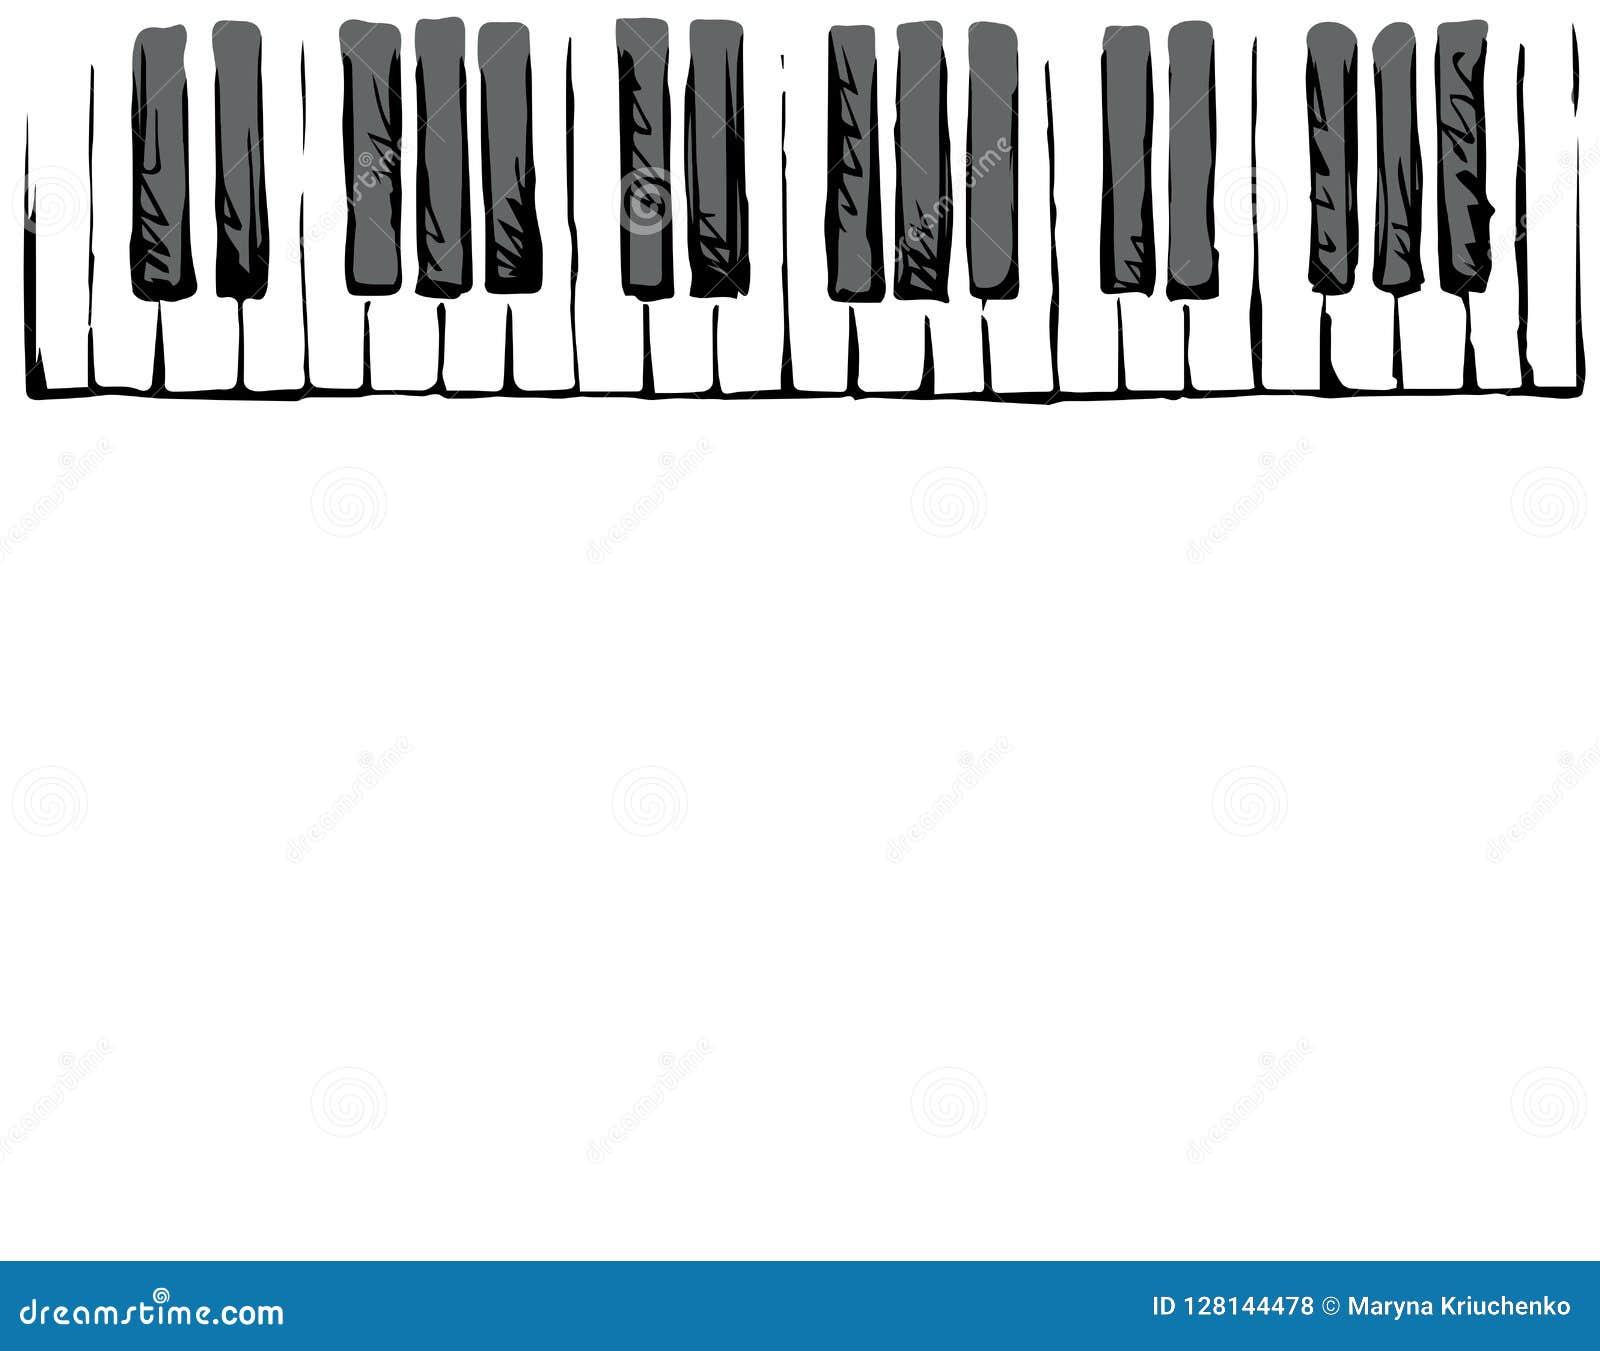 Piano Keys Vector Drawing Stock Vector Illustration Of Graphic 128144478